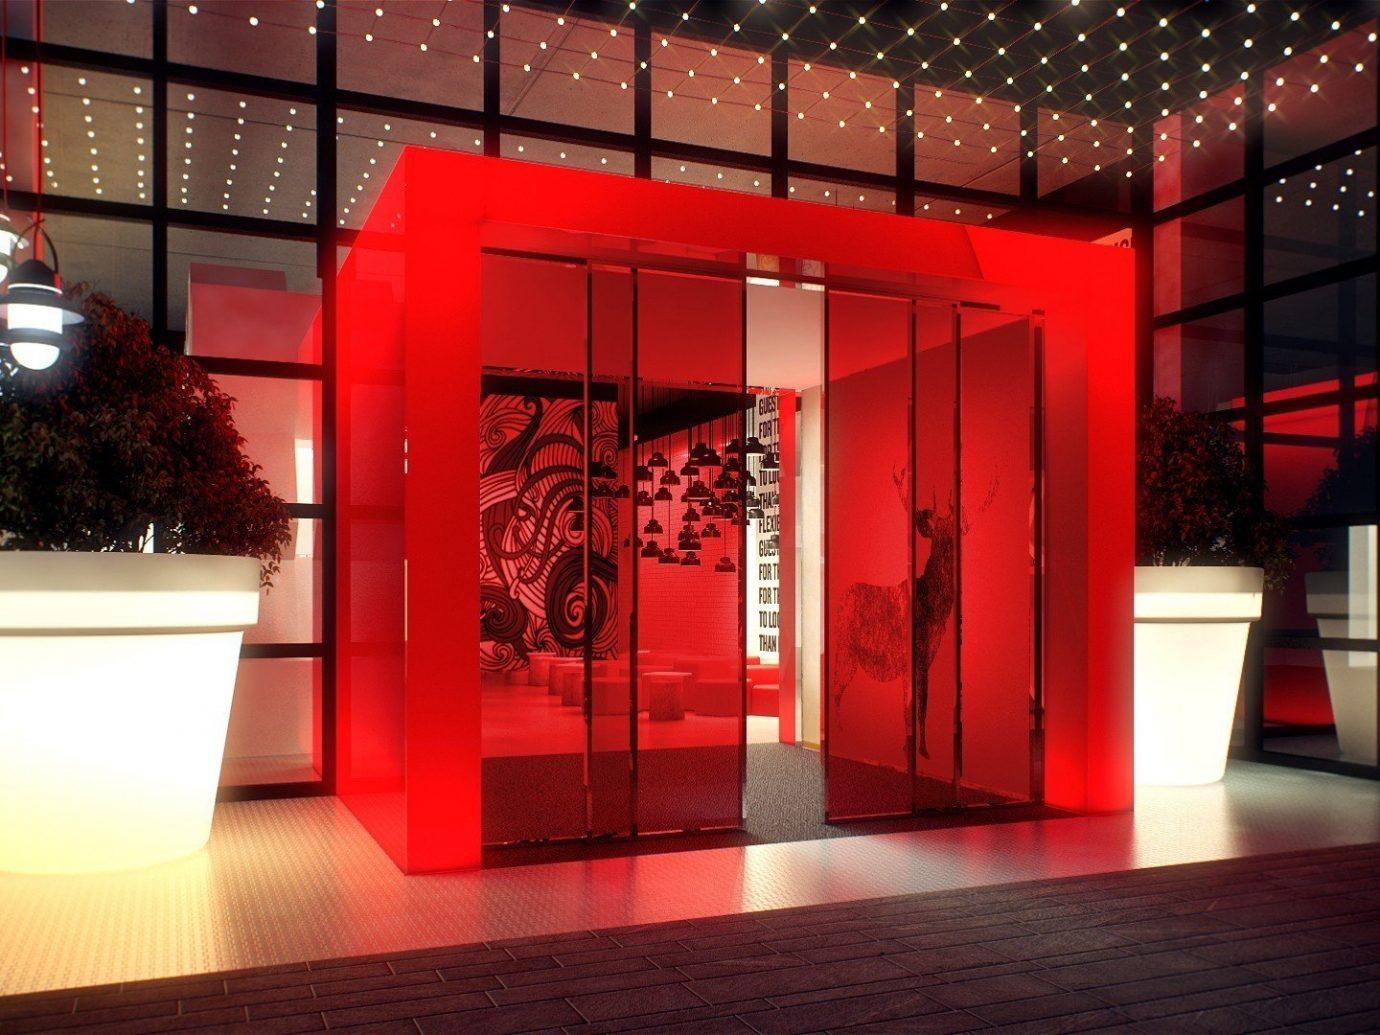 Hotels floor red indoor interior design Design Lobby display window retail tourist attraction